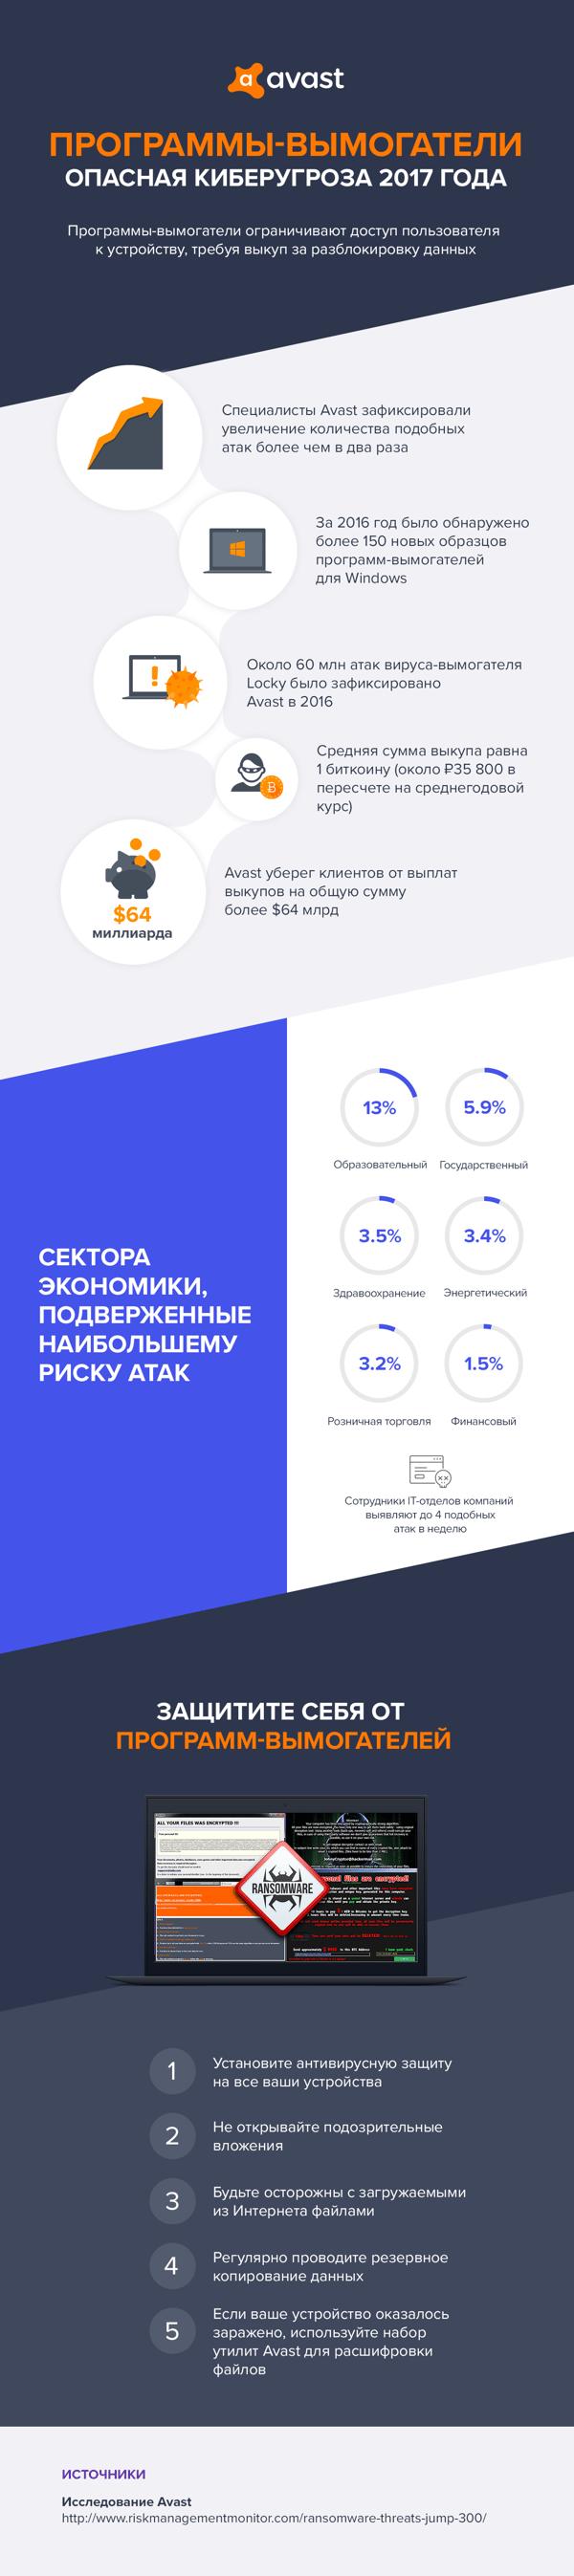 Статистика программ-вымогателей